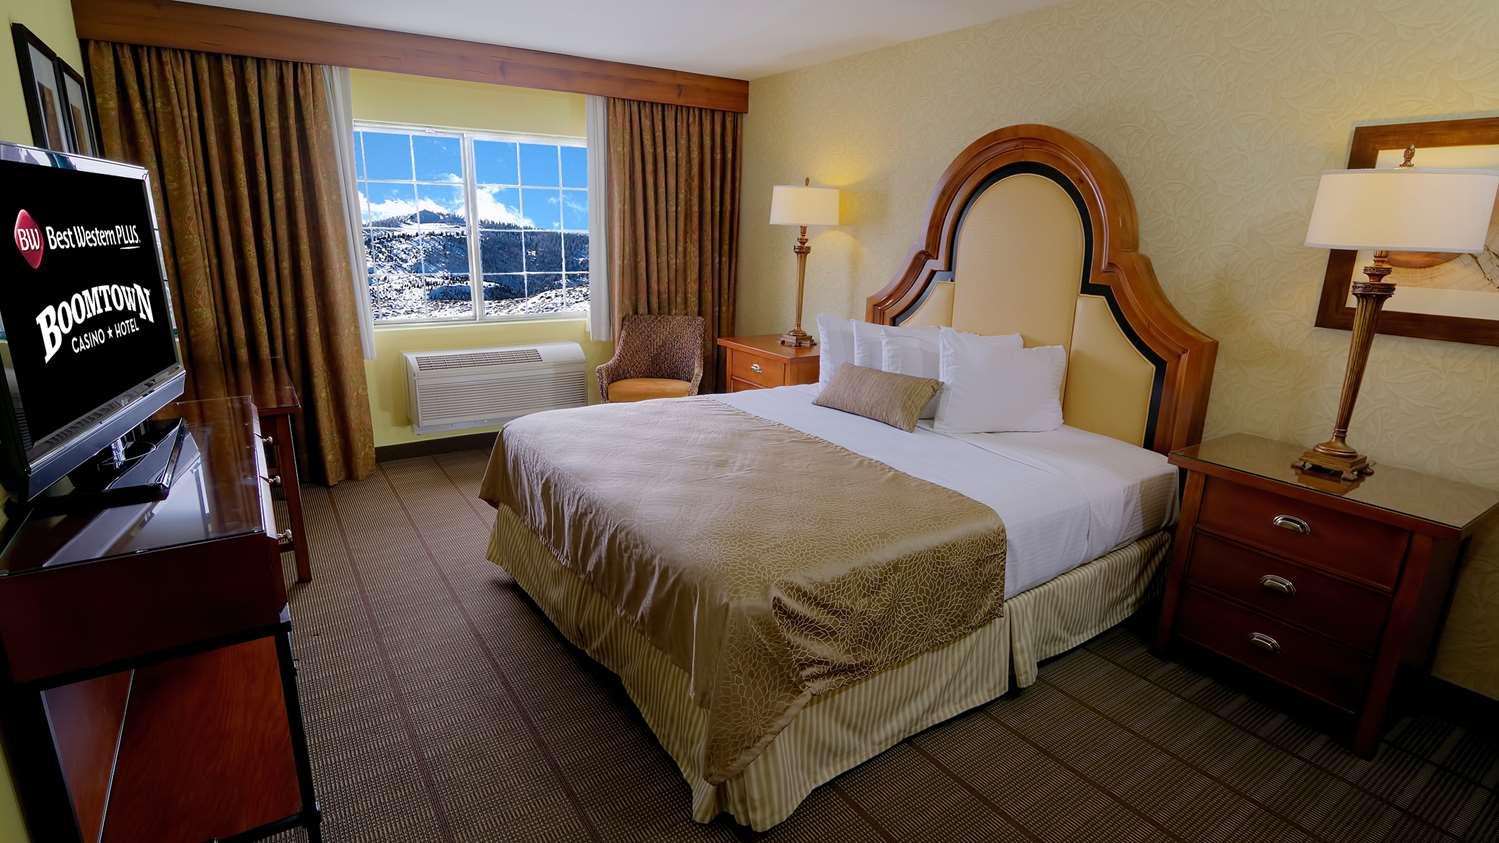 Boomtown hotel and casino verdi nv california casino grand